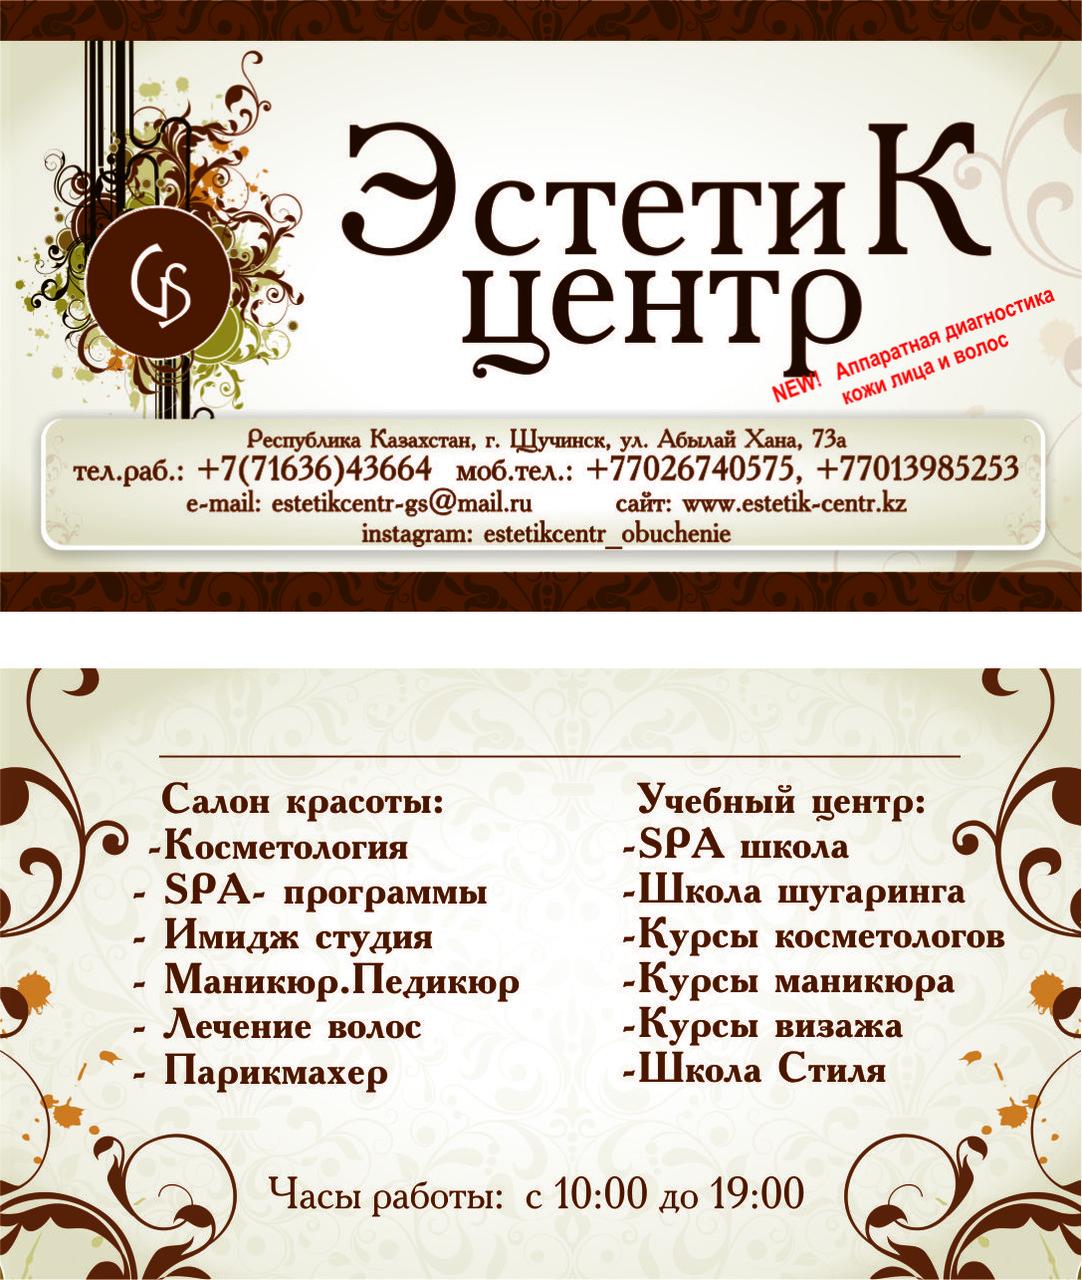 Прайс-лист на услуги (косметология, СПА, массажи, шугаринг и др)